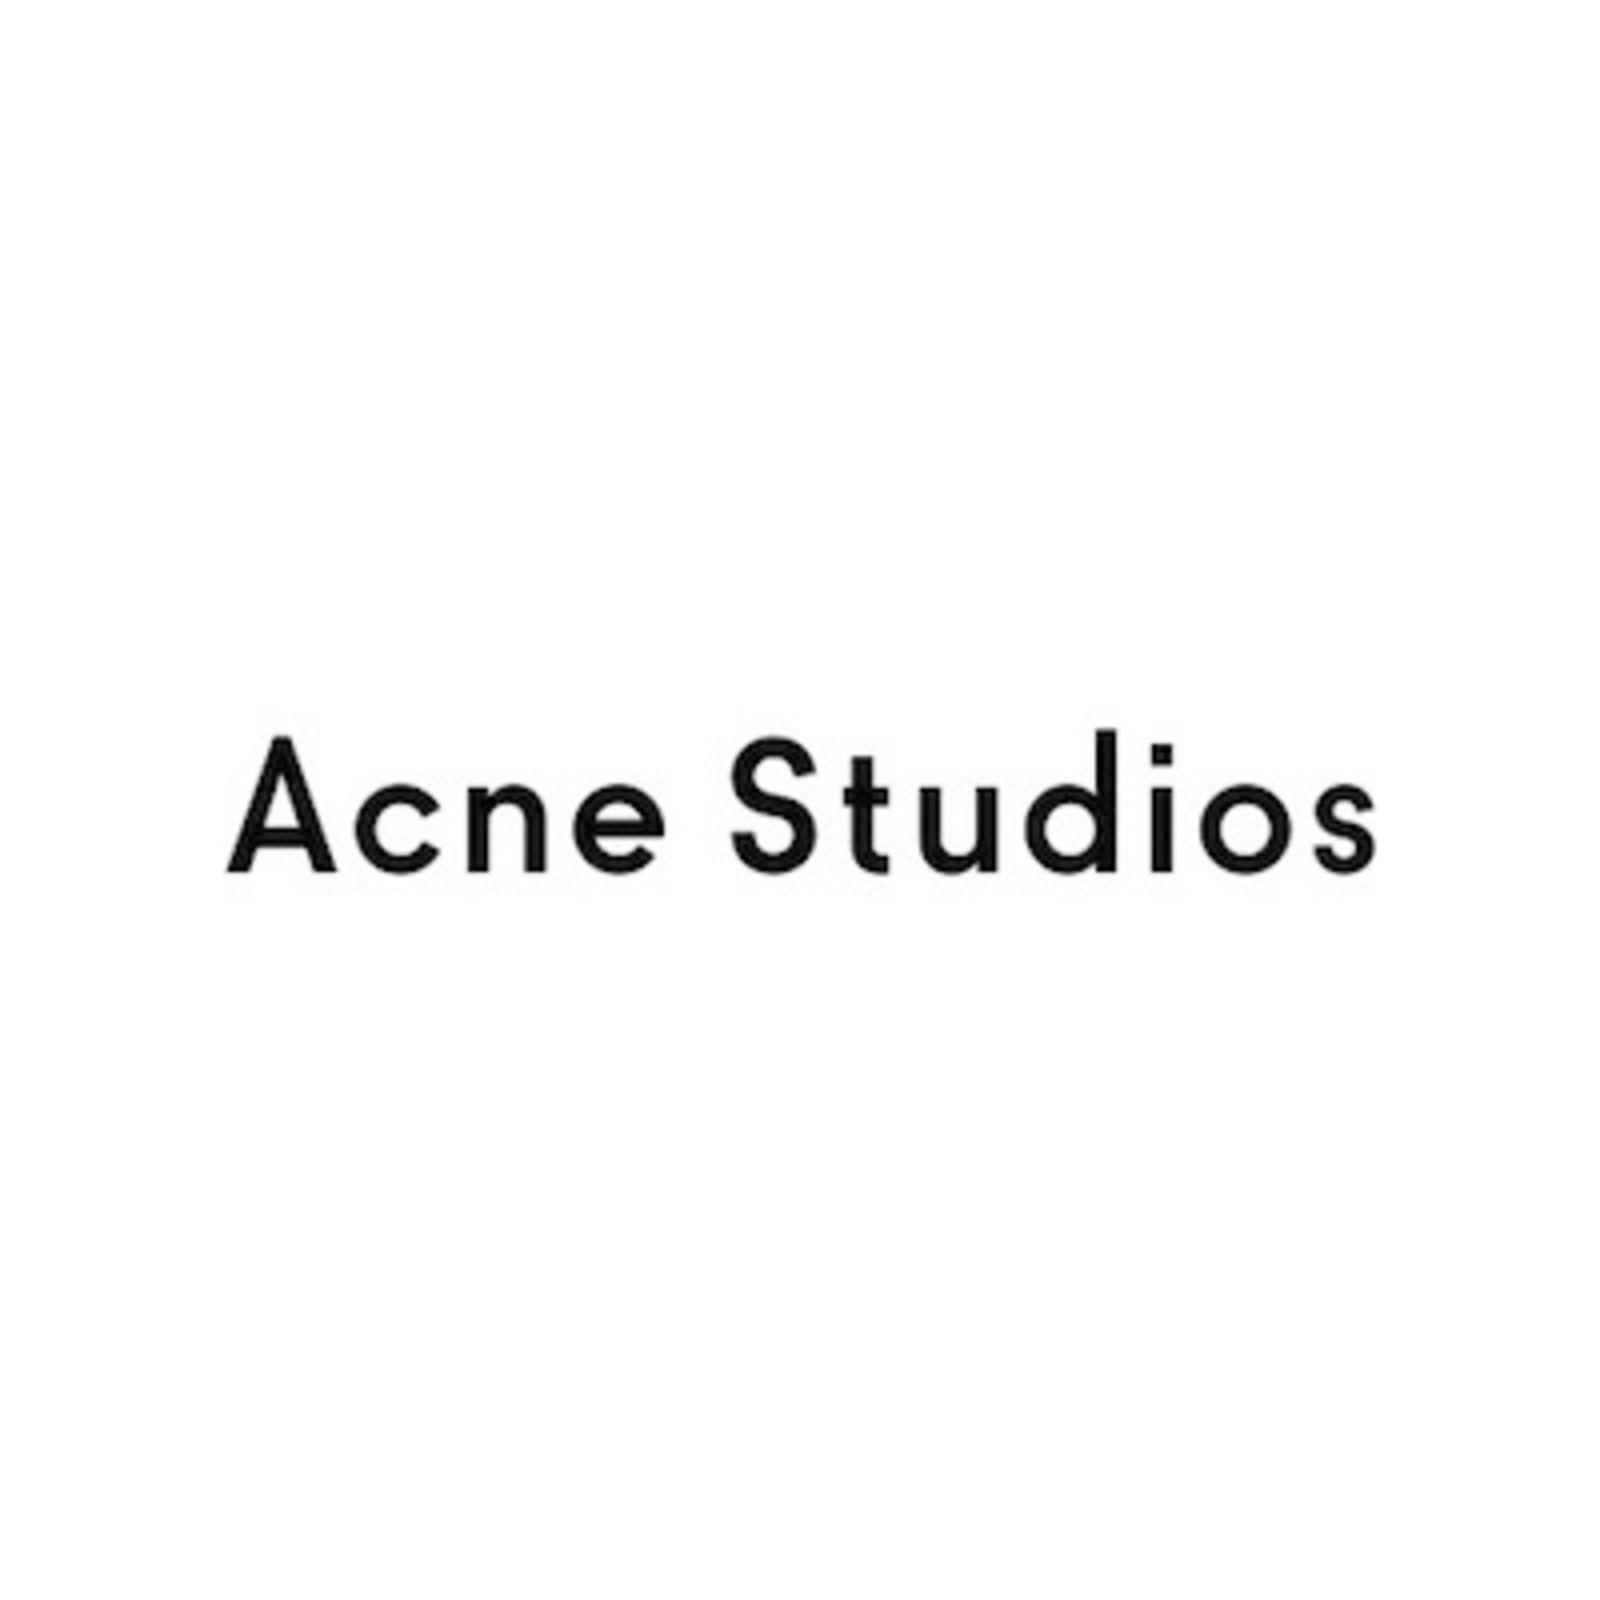 Acne Studios (Bild 1)